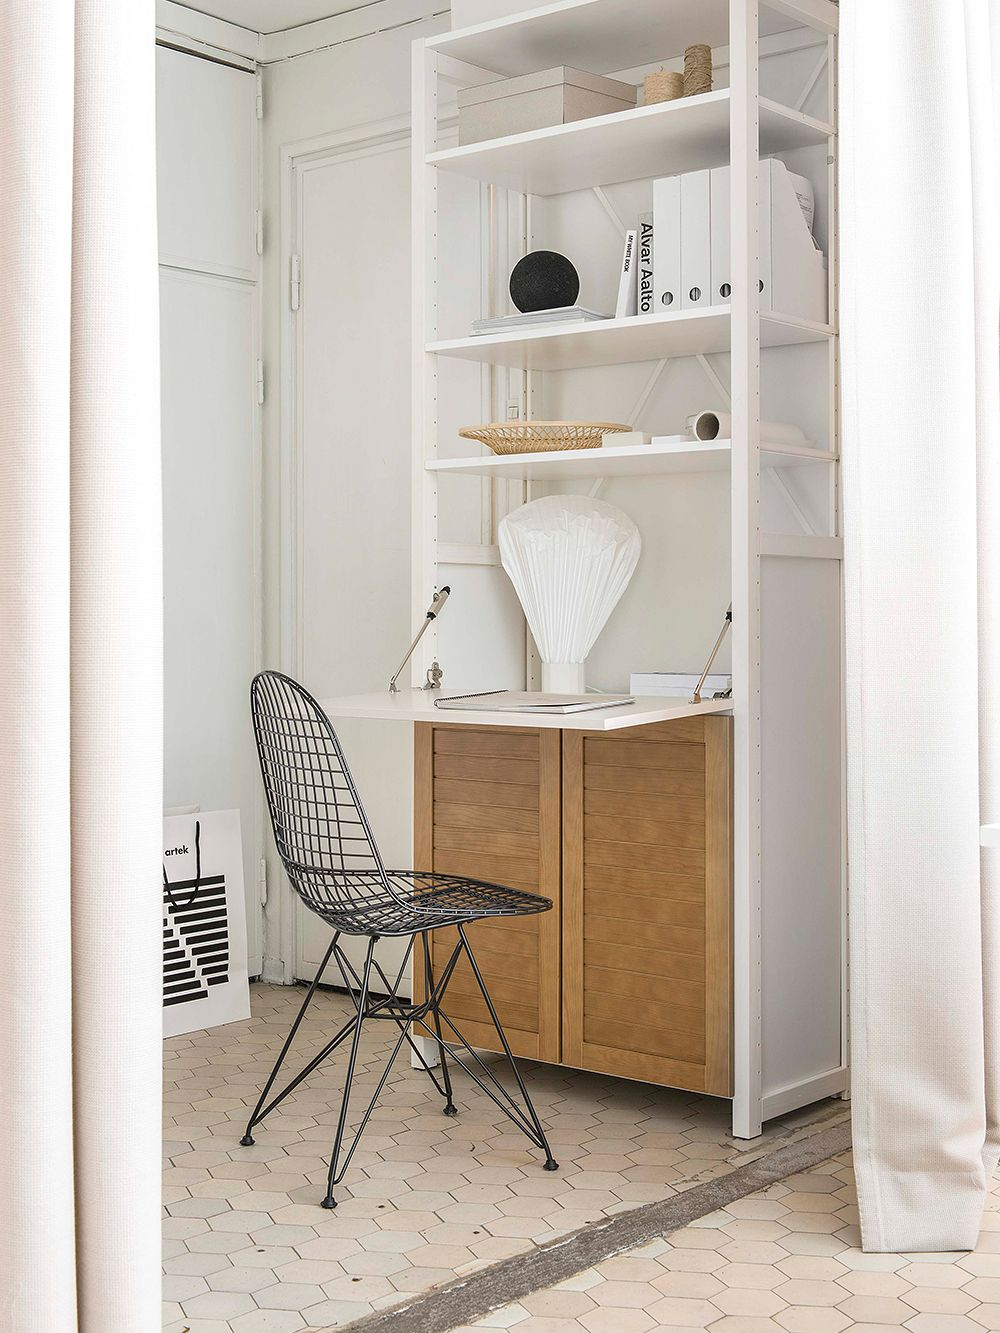 The Helsinki studio of Laura Seppänen